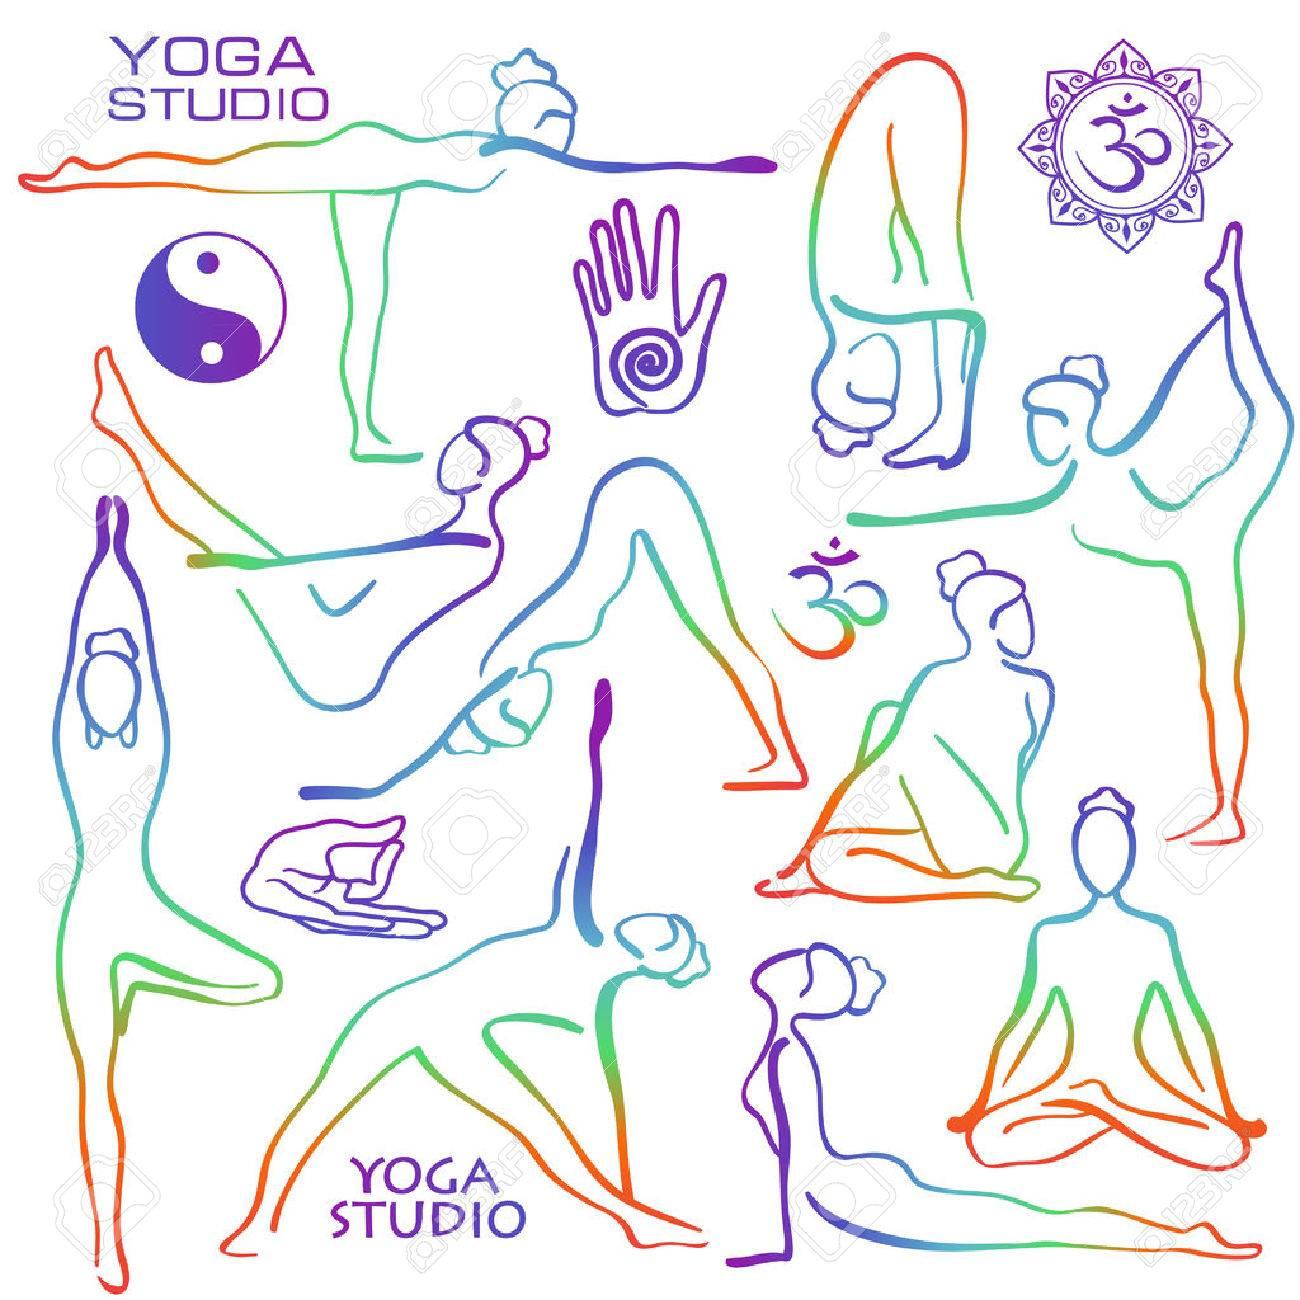 Set of isolated rainbow hand drawn outline yoga poses. Collection of stylized female yoga asanas. - 60154459